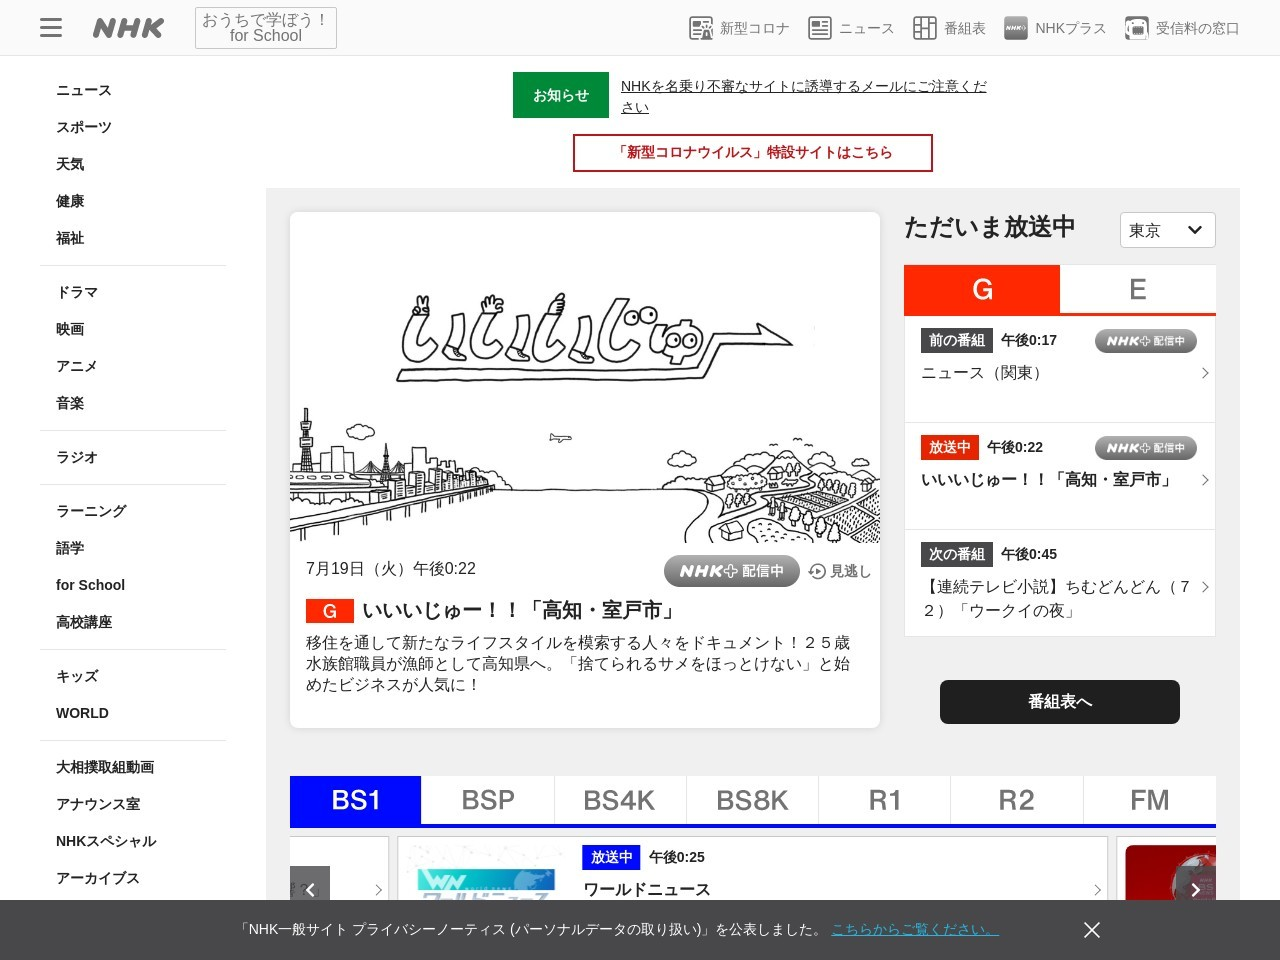 https://www3.nhk.or.jp/news/html/20190415/k10011884241000.html?utm_int=news_contents_news-main_001